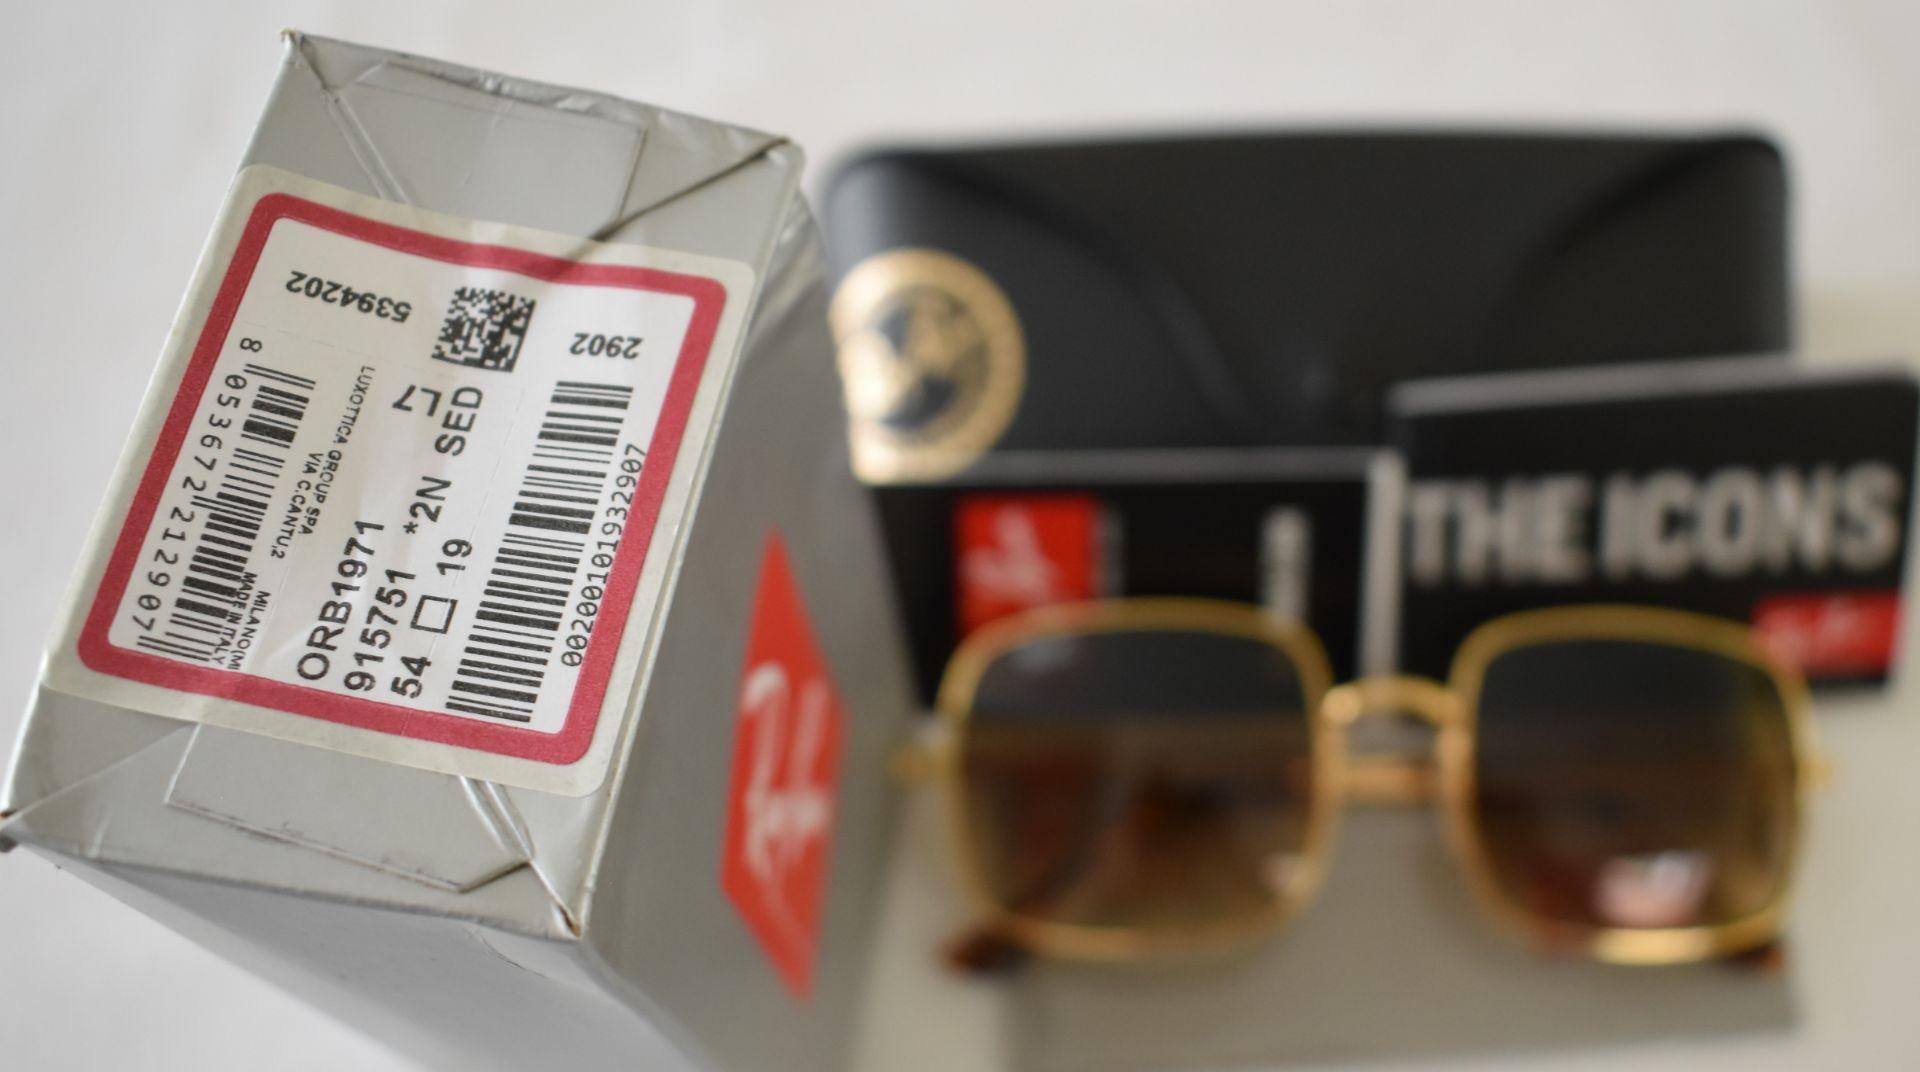 Ray Ban Sunglasses ORB1971 915751 *2N - Image 3 of 3